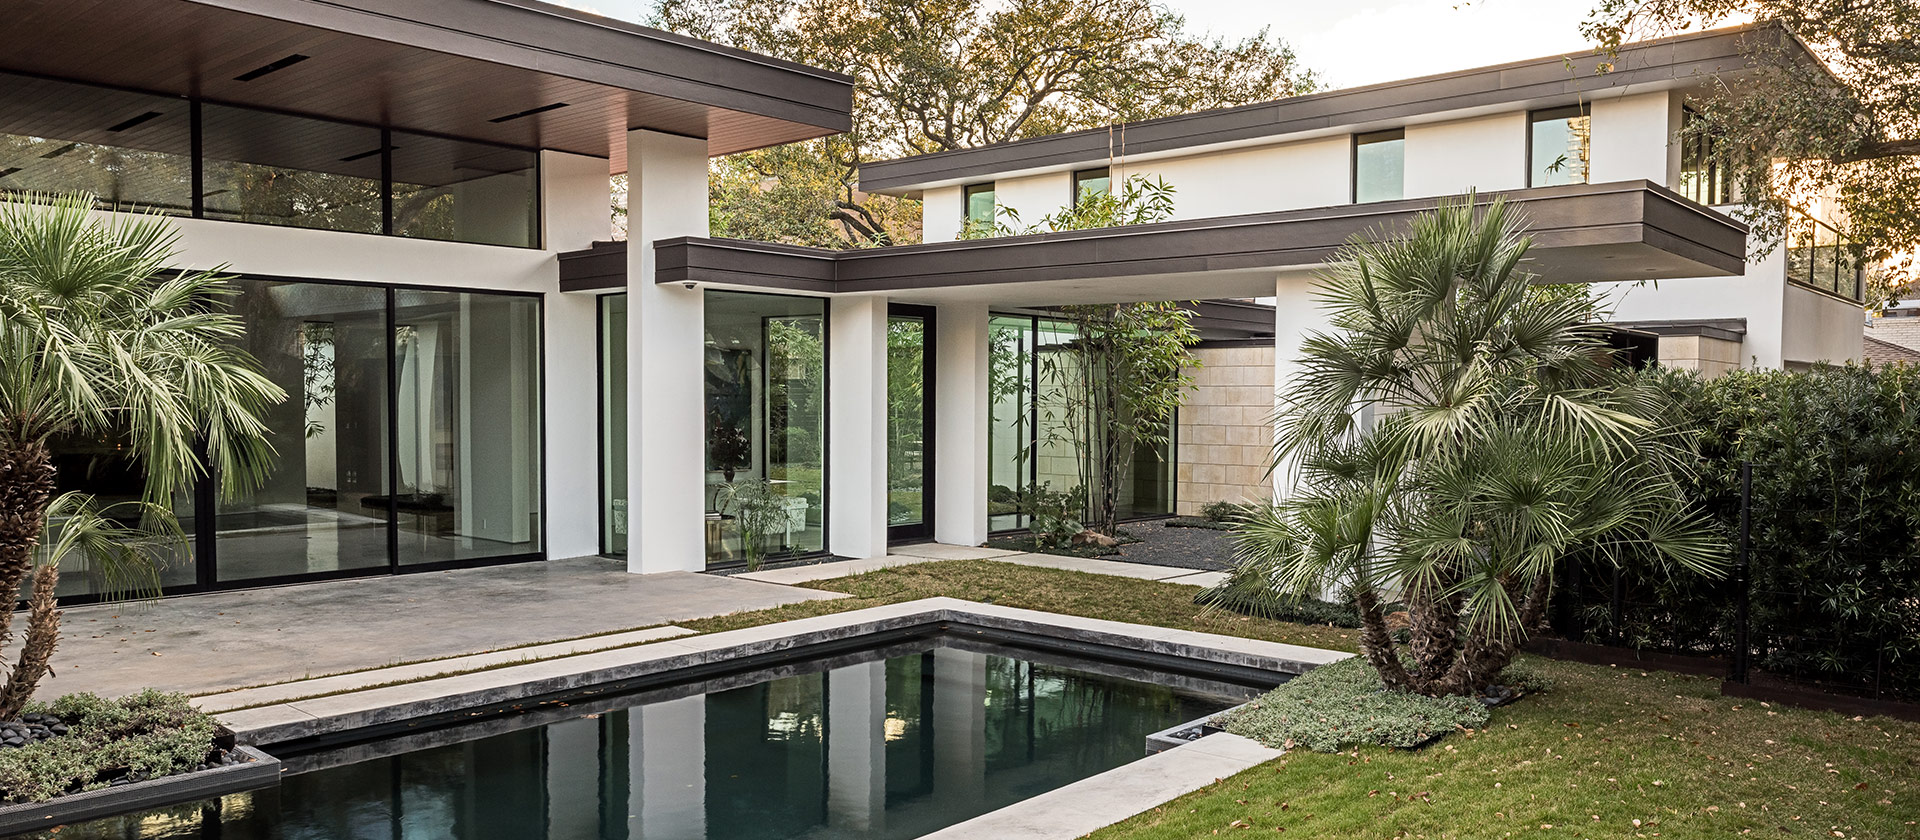 Houston Architect, Courtyard Photo